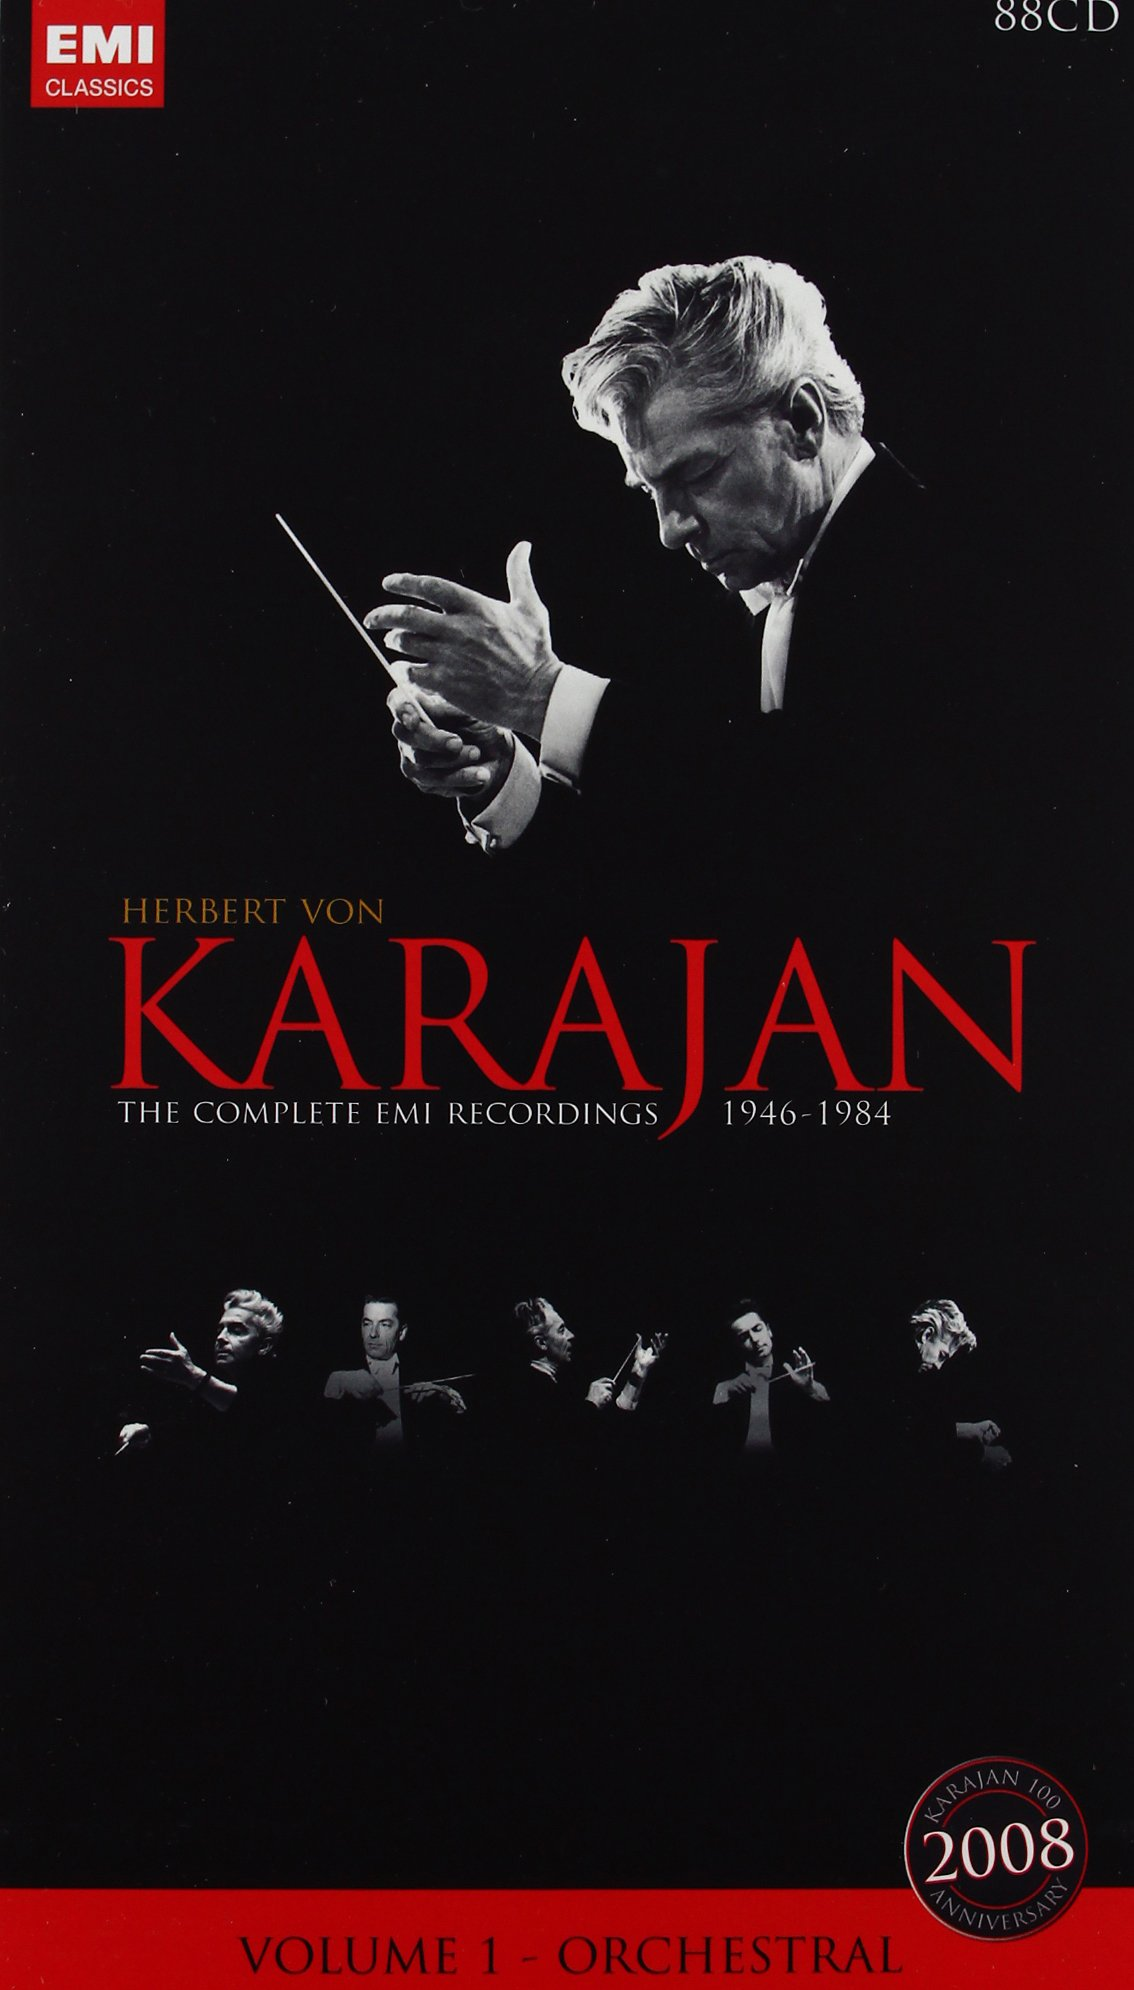 Herbert von Karajan - Complete EMI Recordings 1946-1984, Vol. 1: Orchestral by Warner Classics